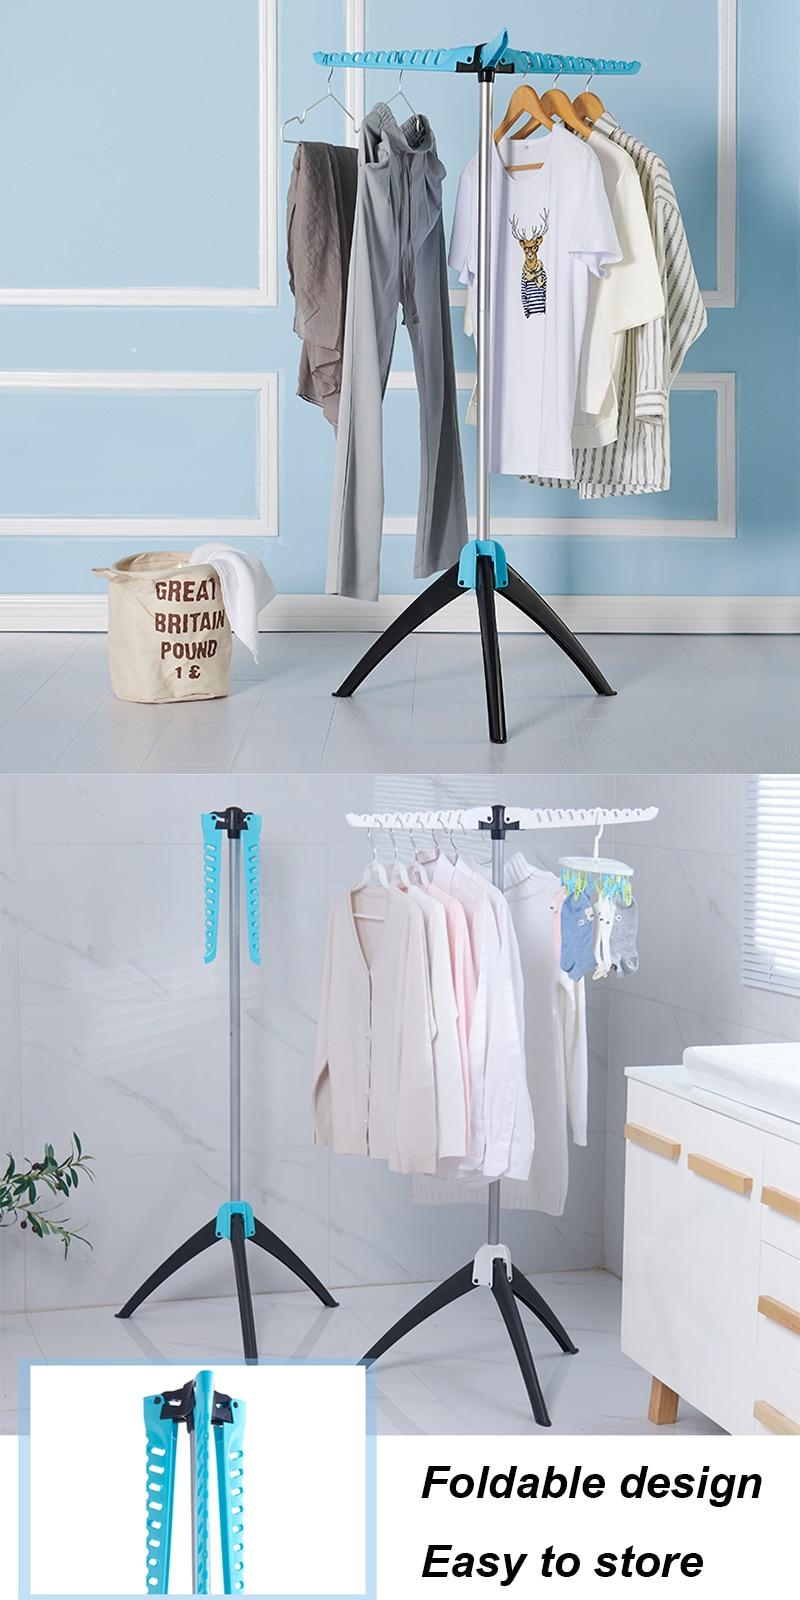 Untior Stainless Drying Rack Hanger